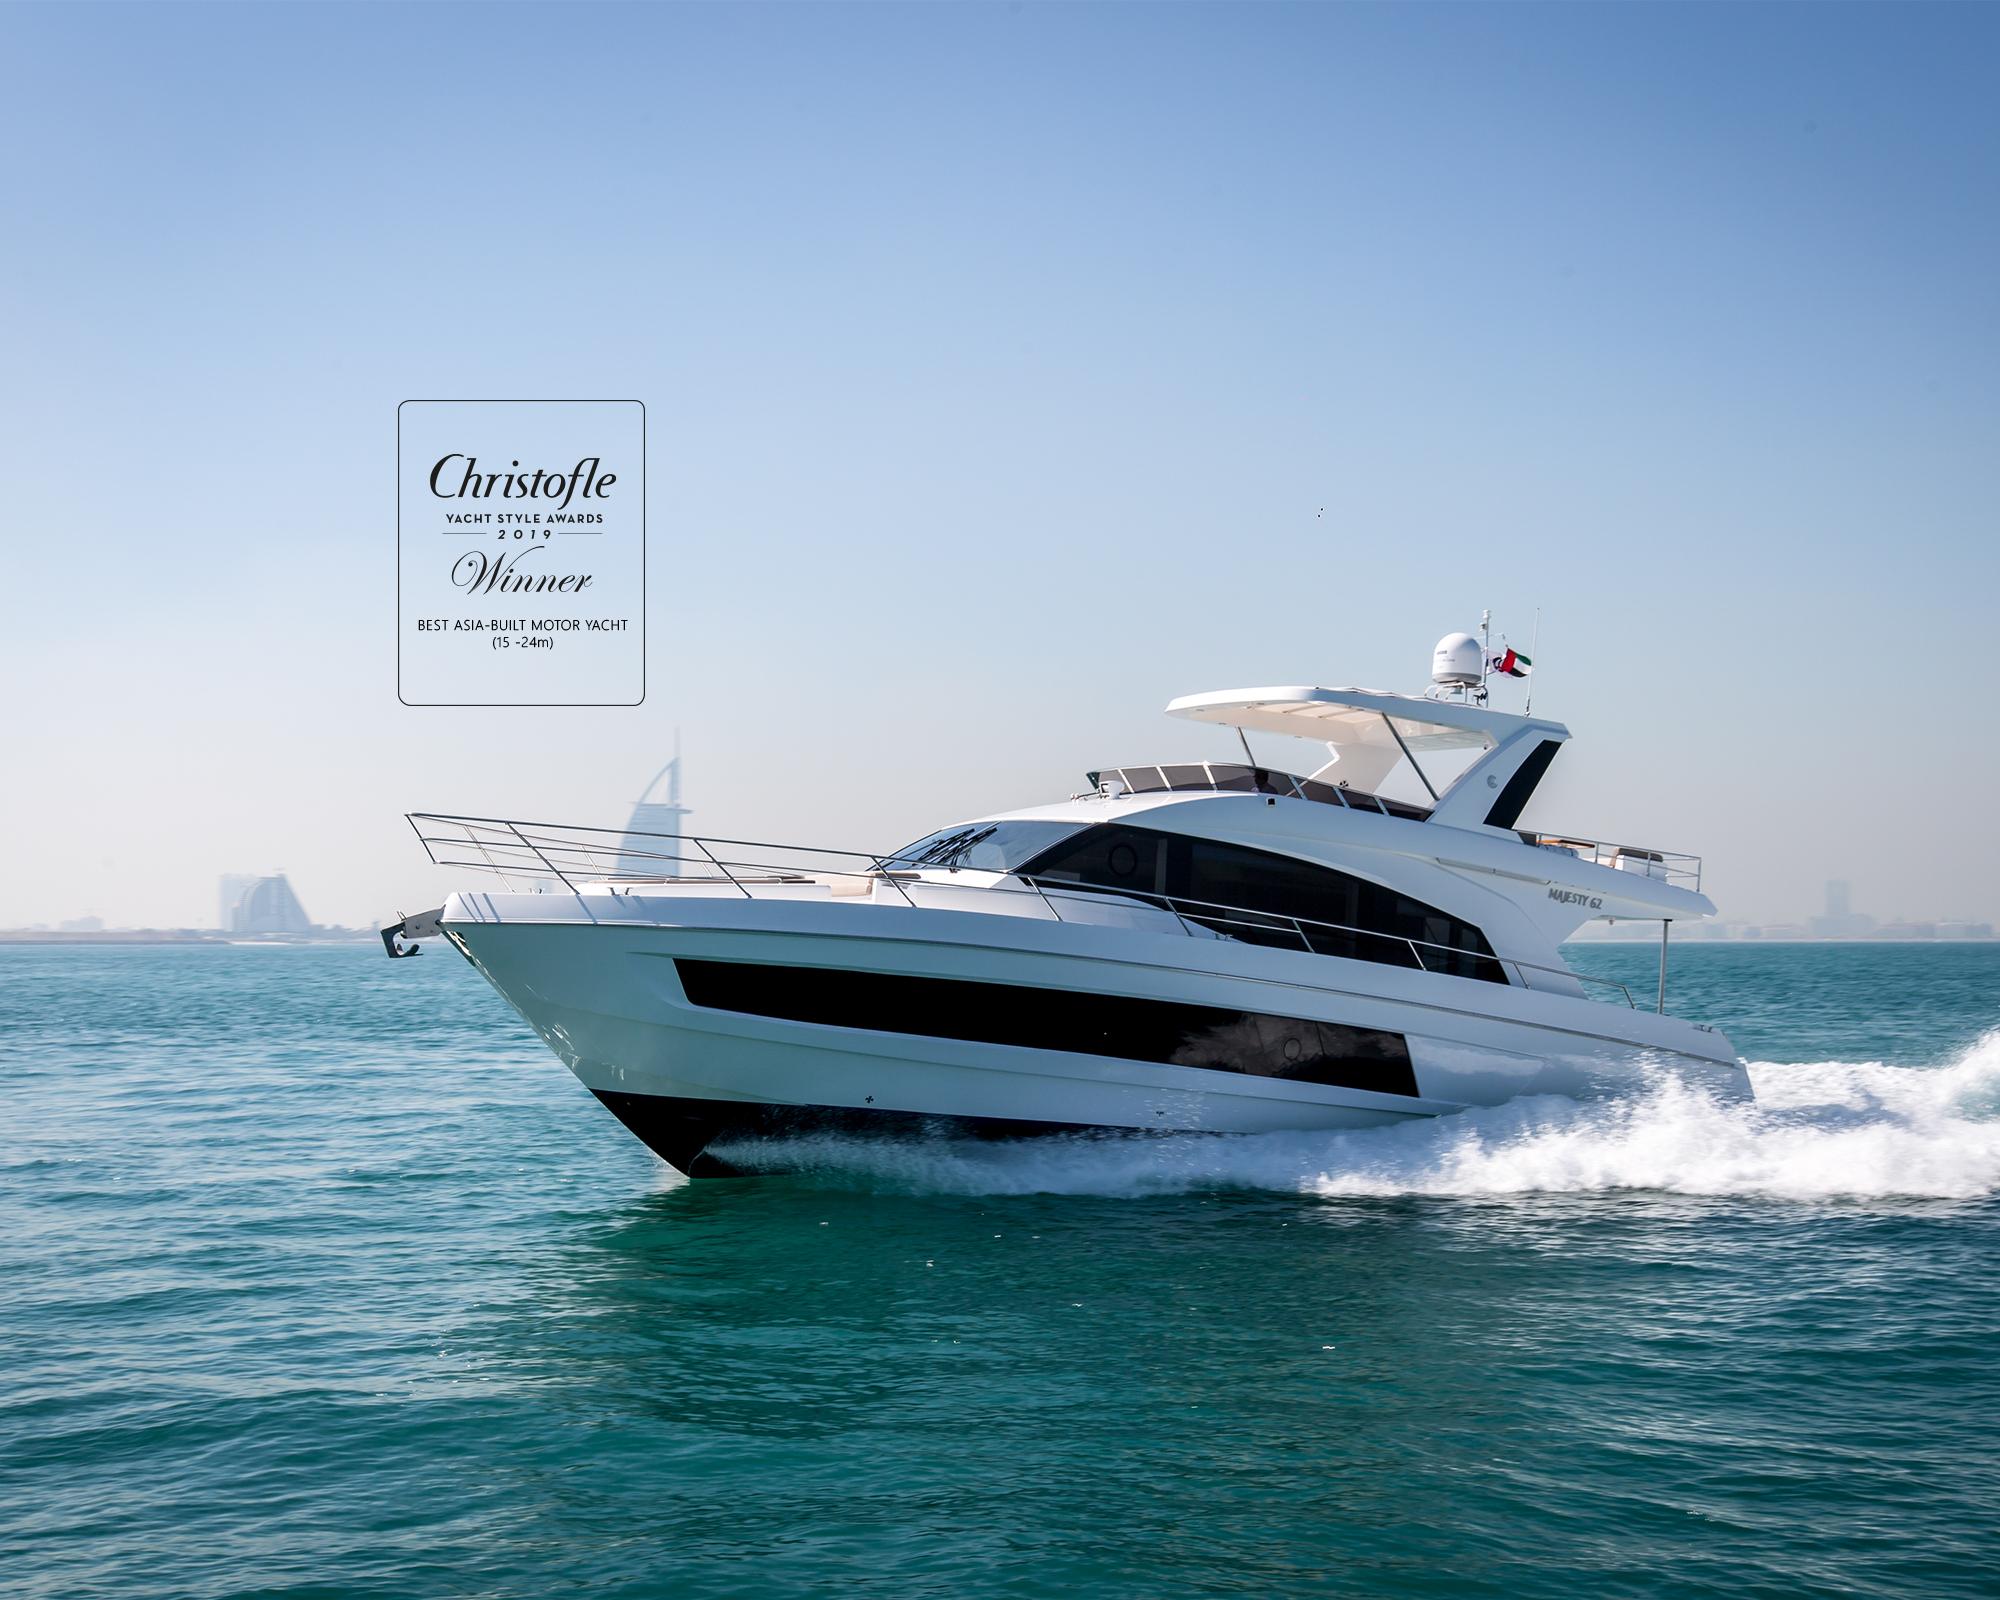 Majesty 62 receives Best Asia-Built Motor Yacht Award